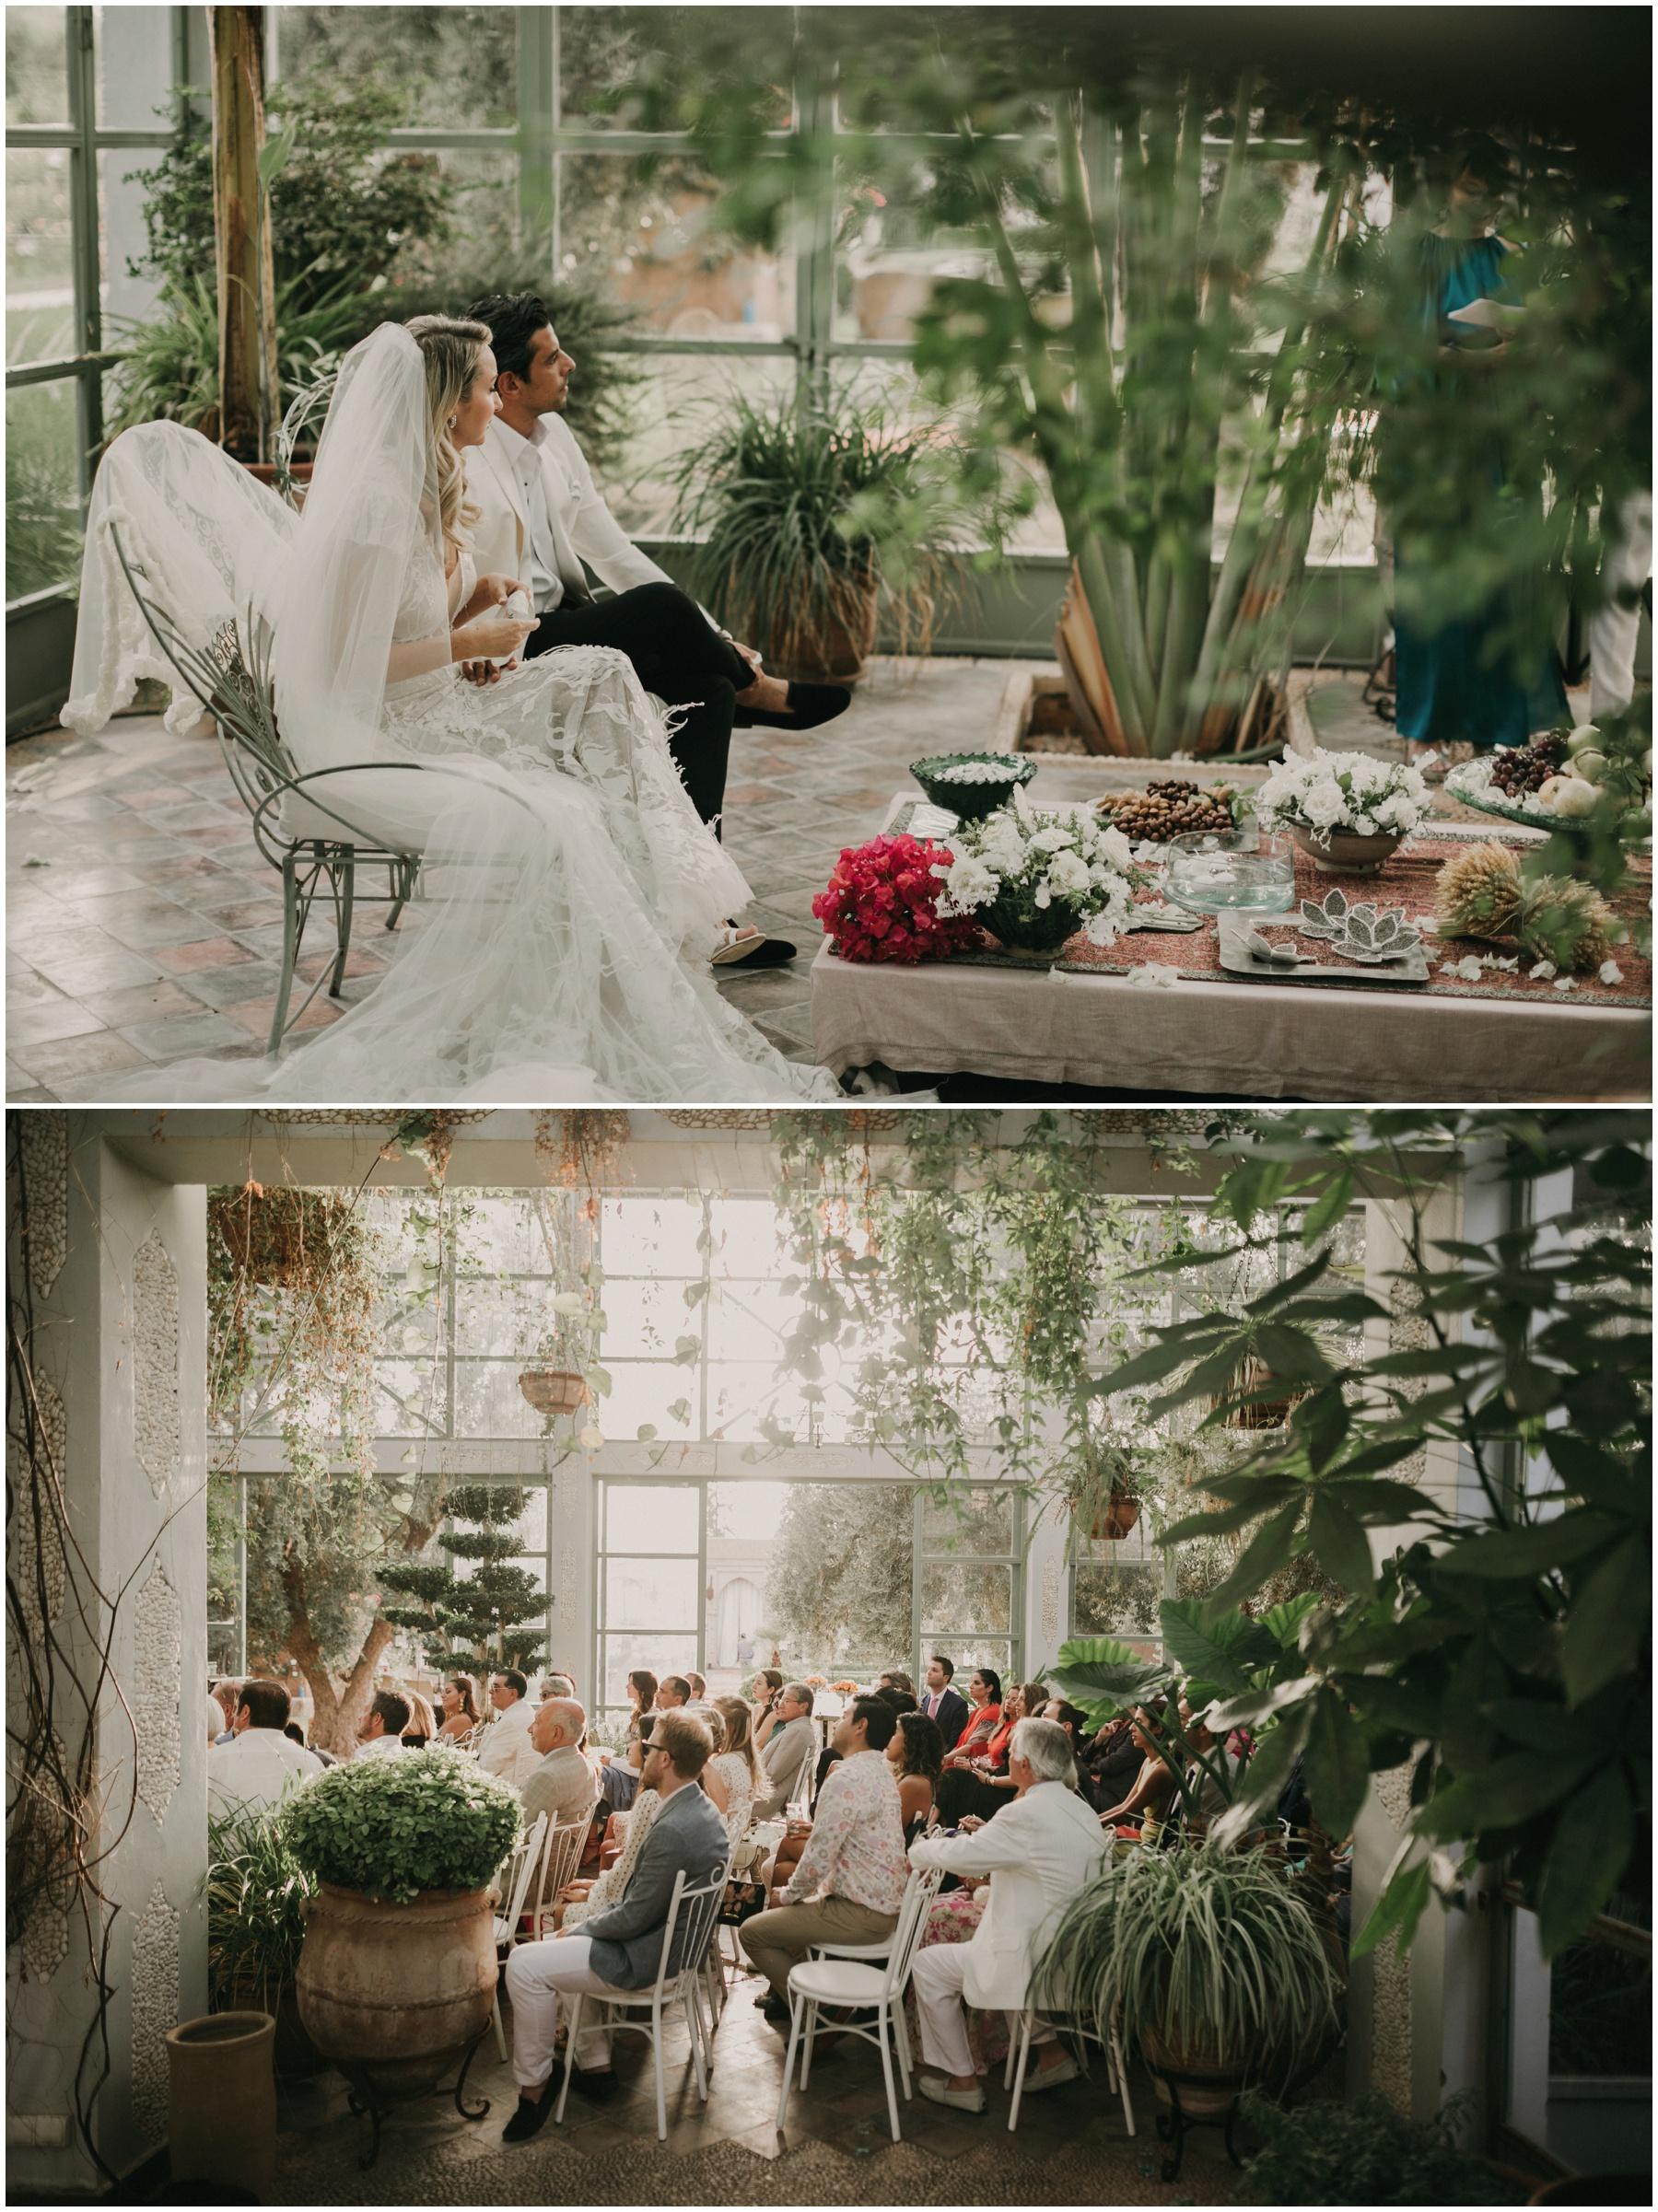 Marrakech Wedding Beldi Coutry Club 042.JPG